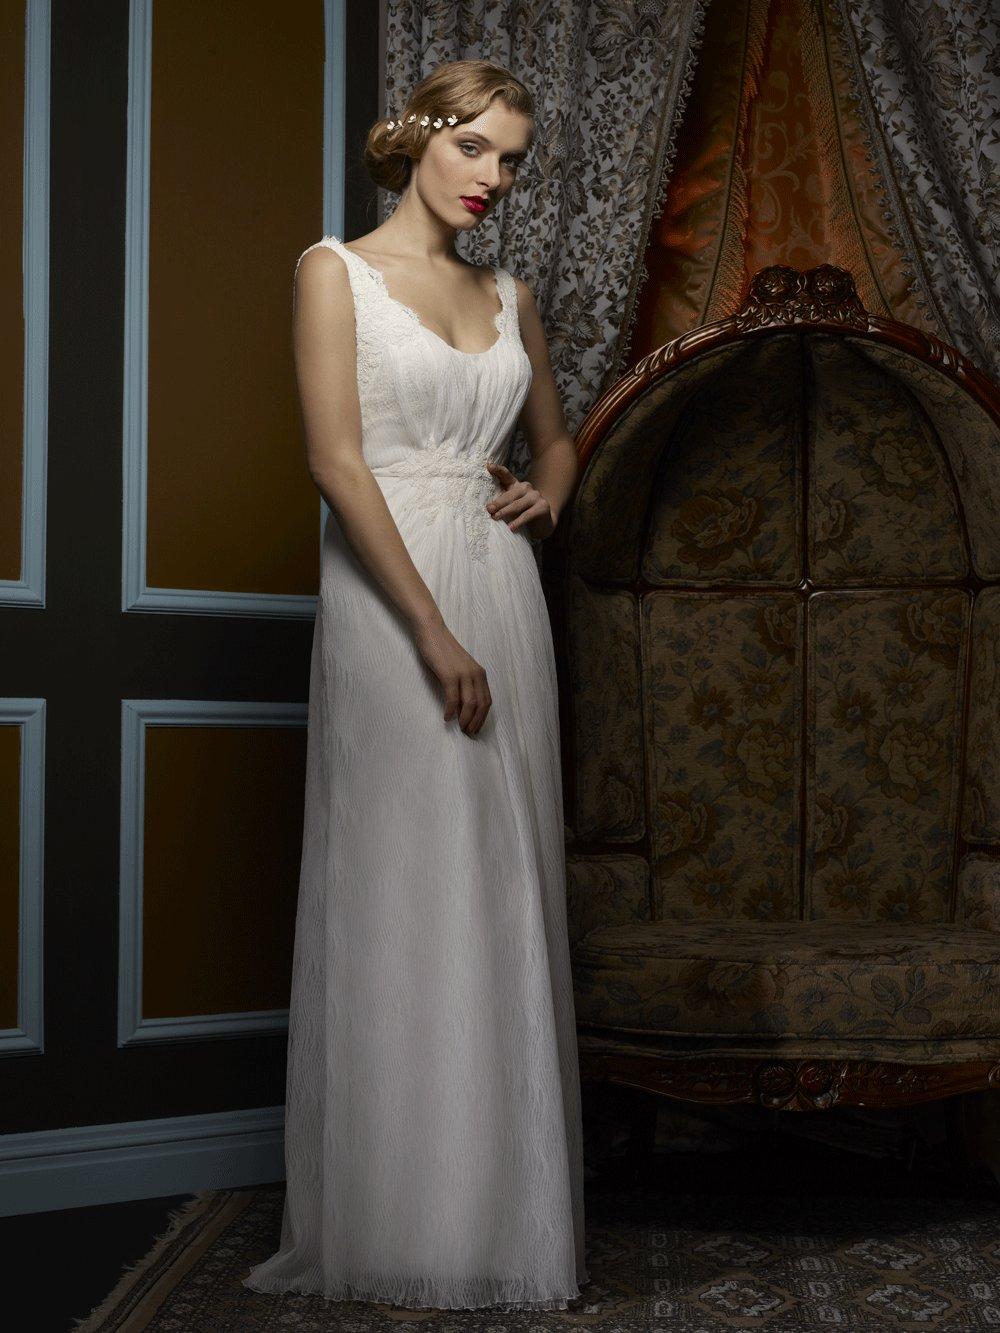 Wedding-dress-by-birnbaum-and-bullock-2013-bridal-petra.full